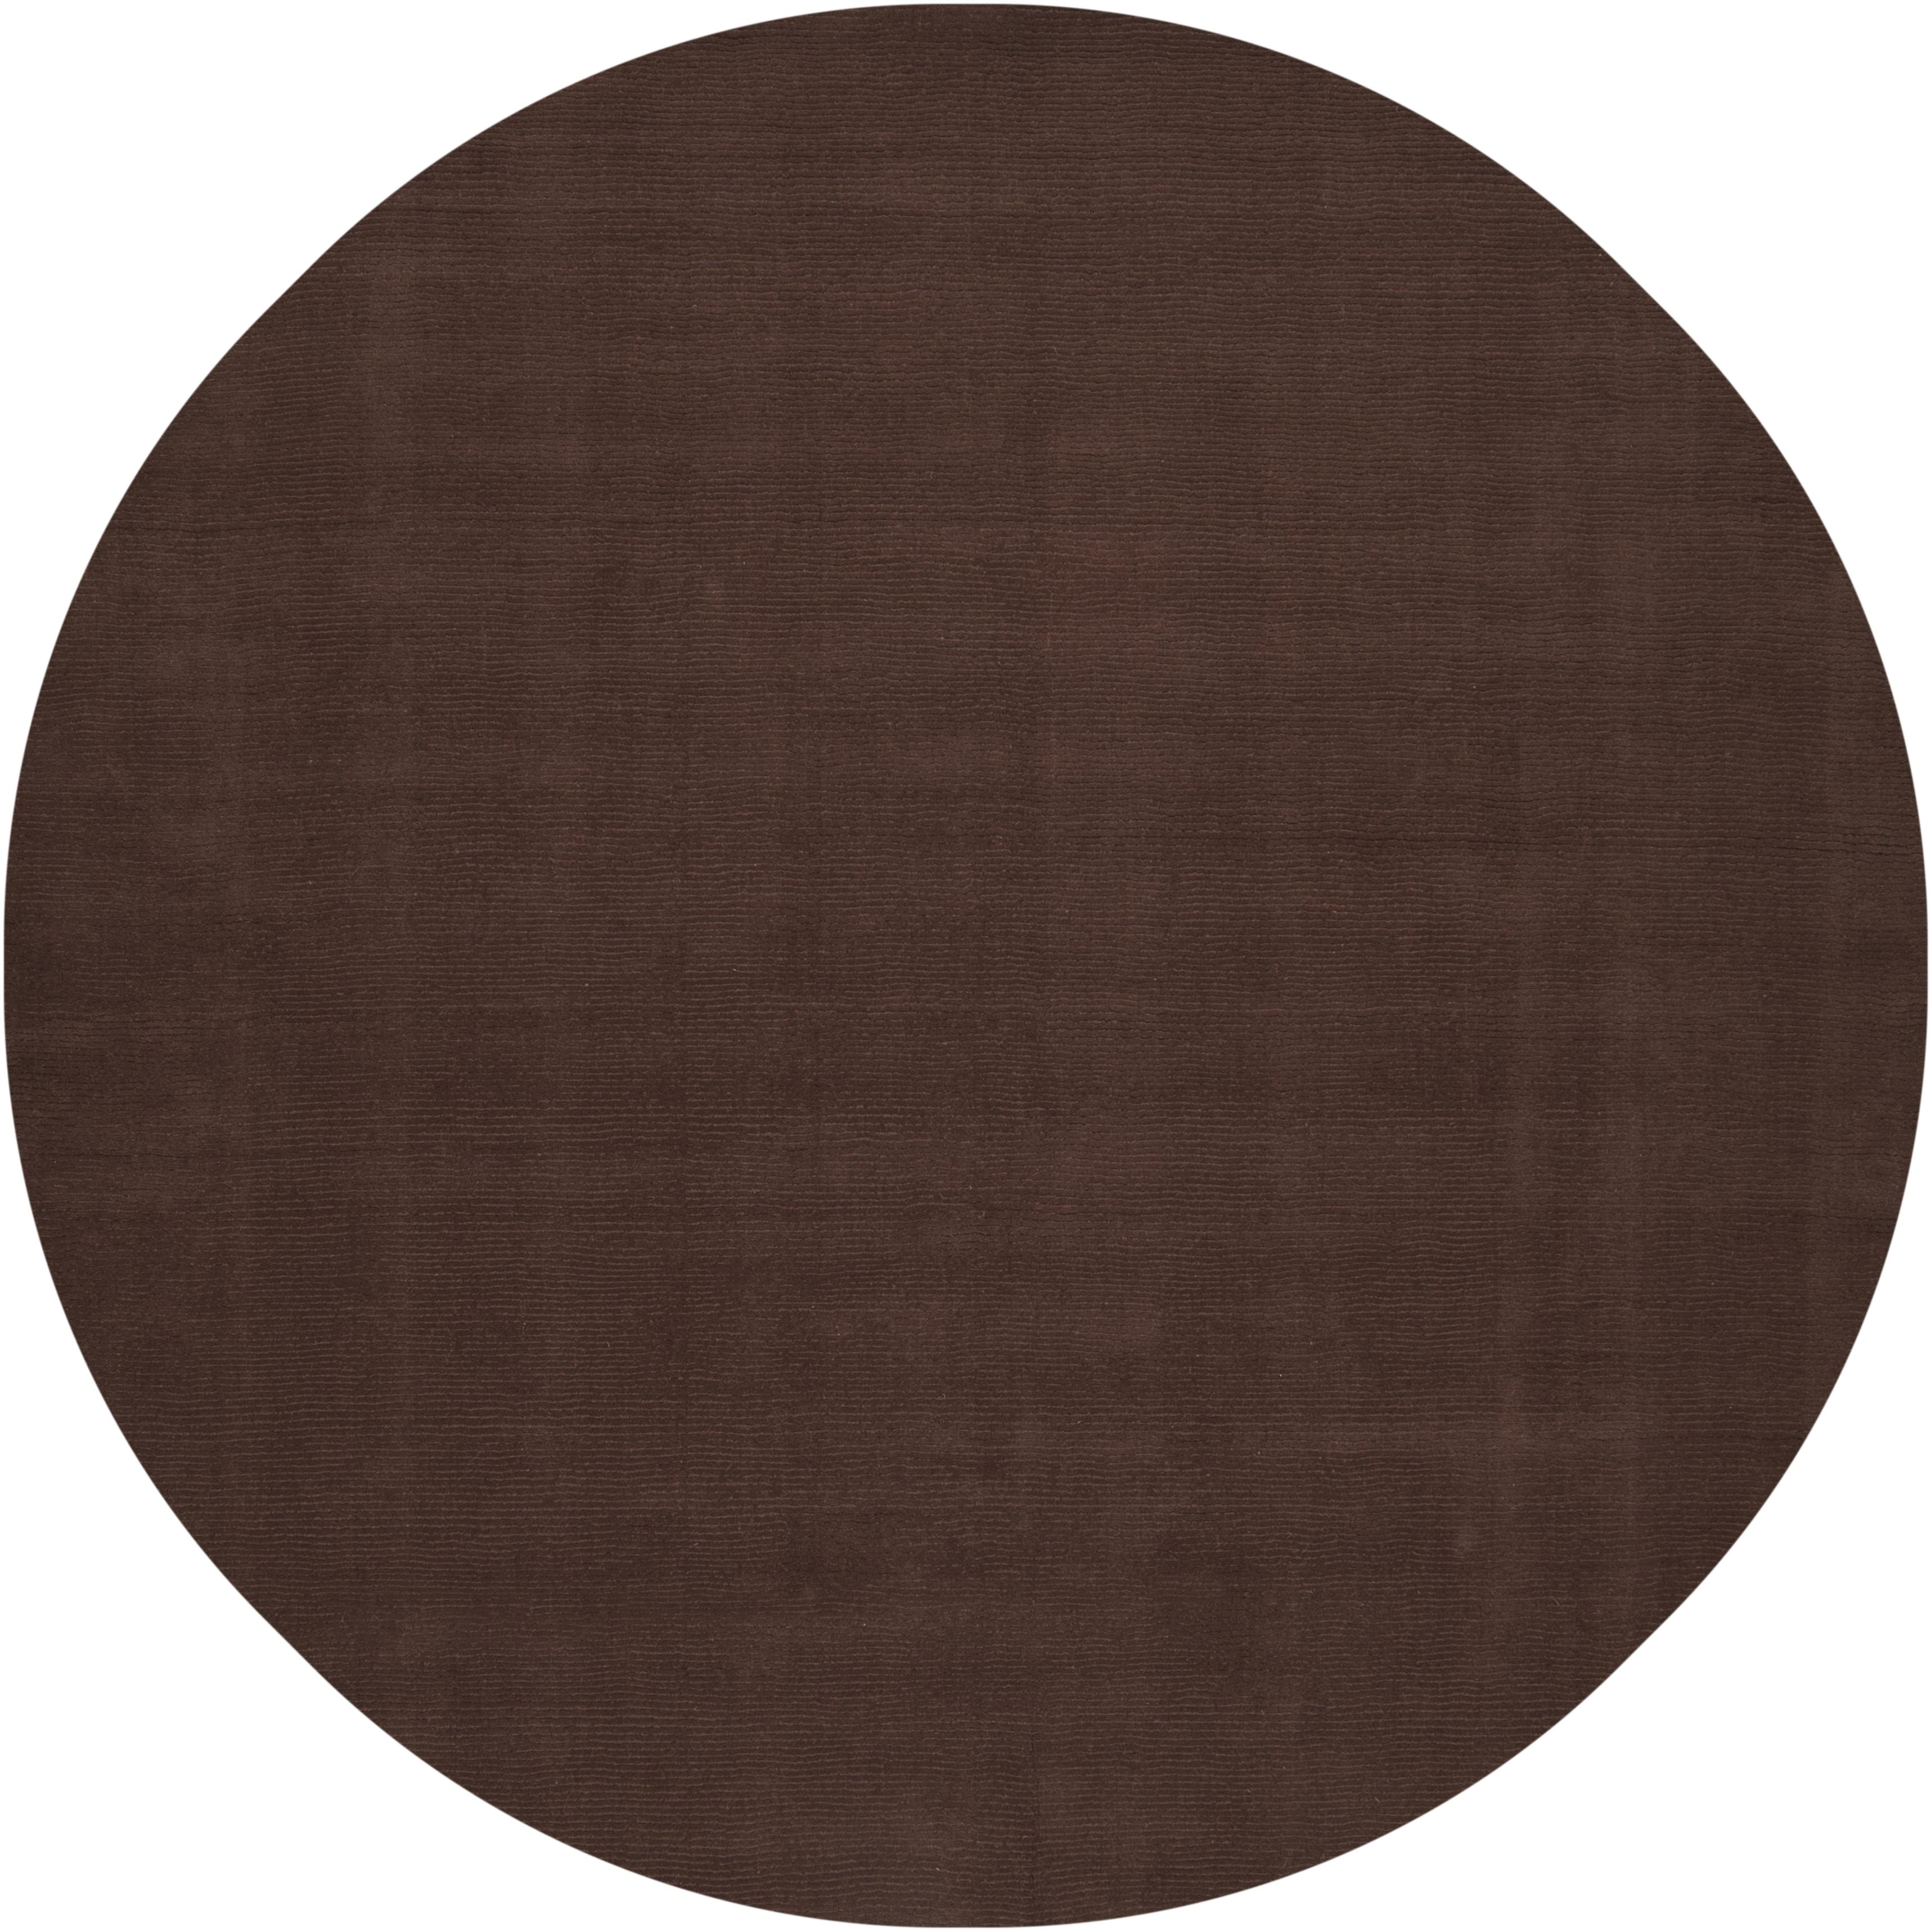 Surya Rugs Mystique 8' Round - Item Number: M334-8RD